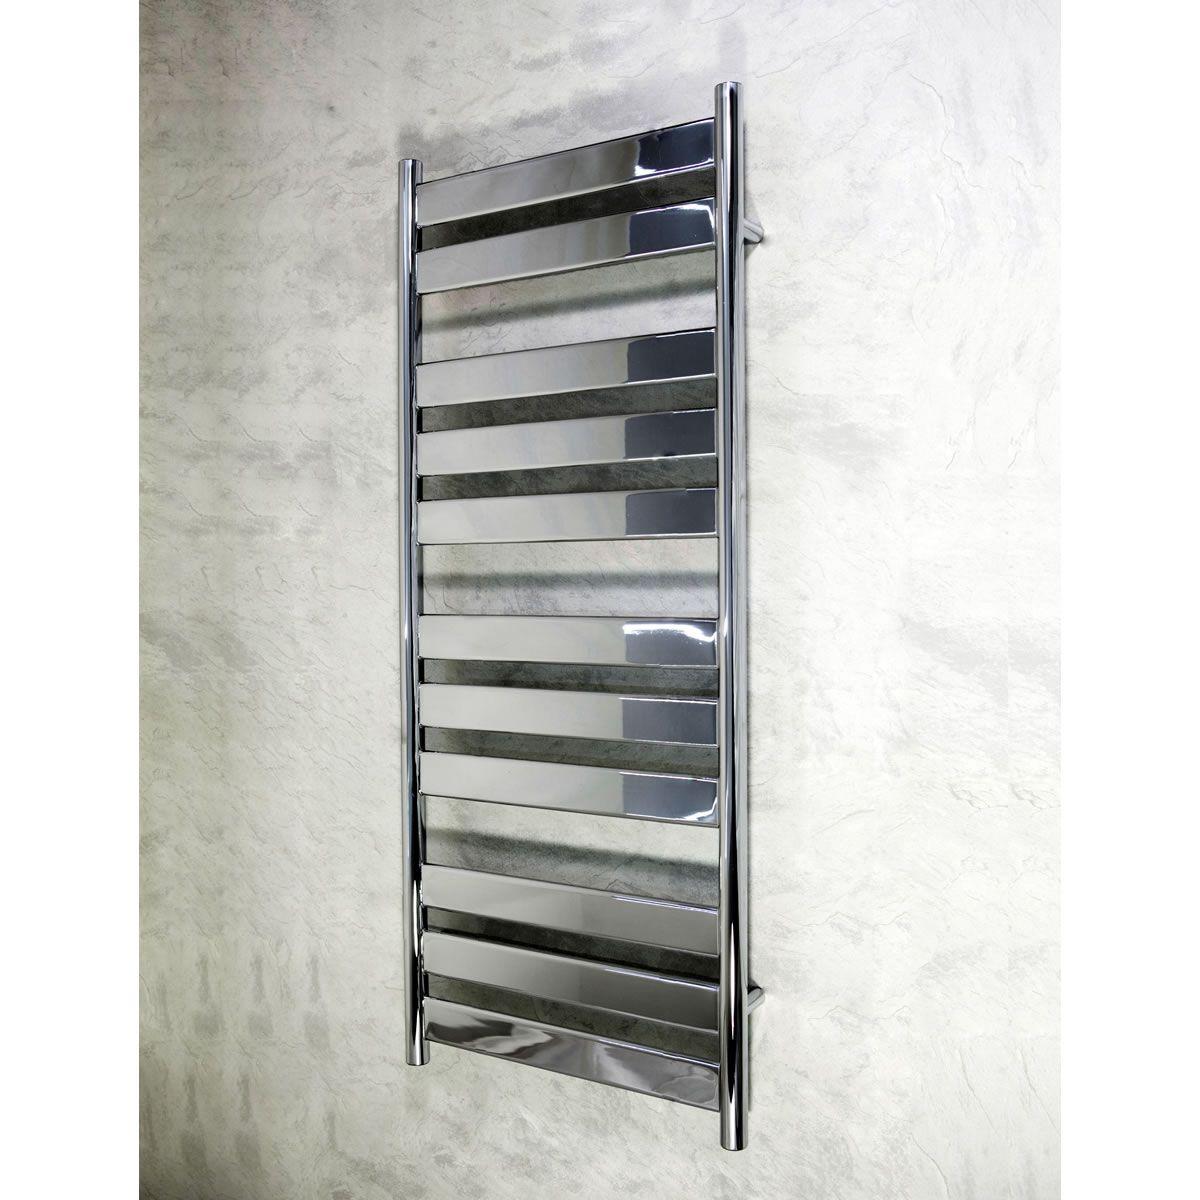 origins azor designer towel warming radiator uk bathrooms. Black Bedroom Furniture Sets. Home Design Ideas